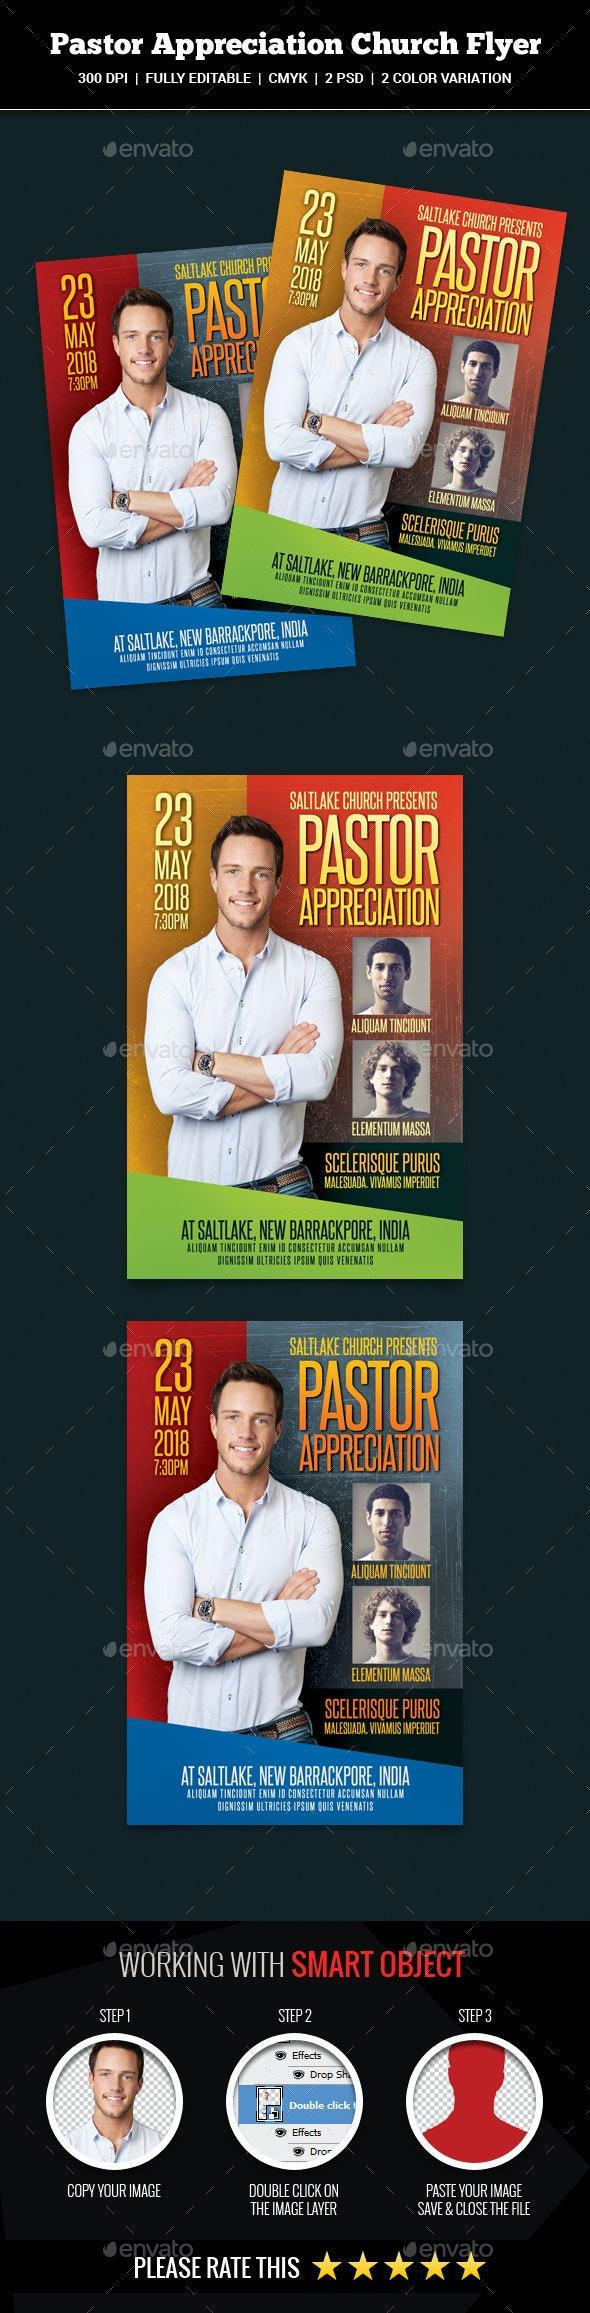 Pastor Appreciation Church Flyer - Church Flyers